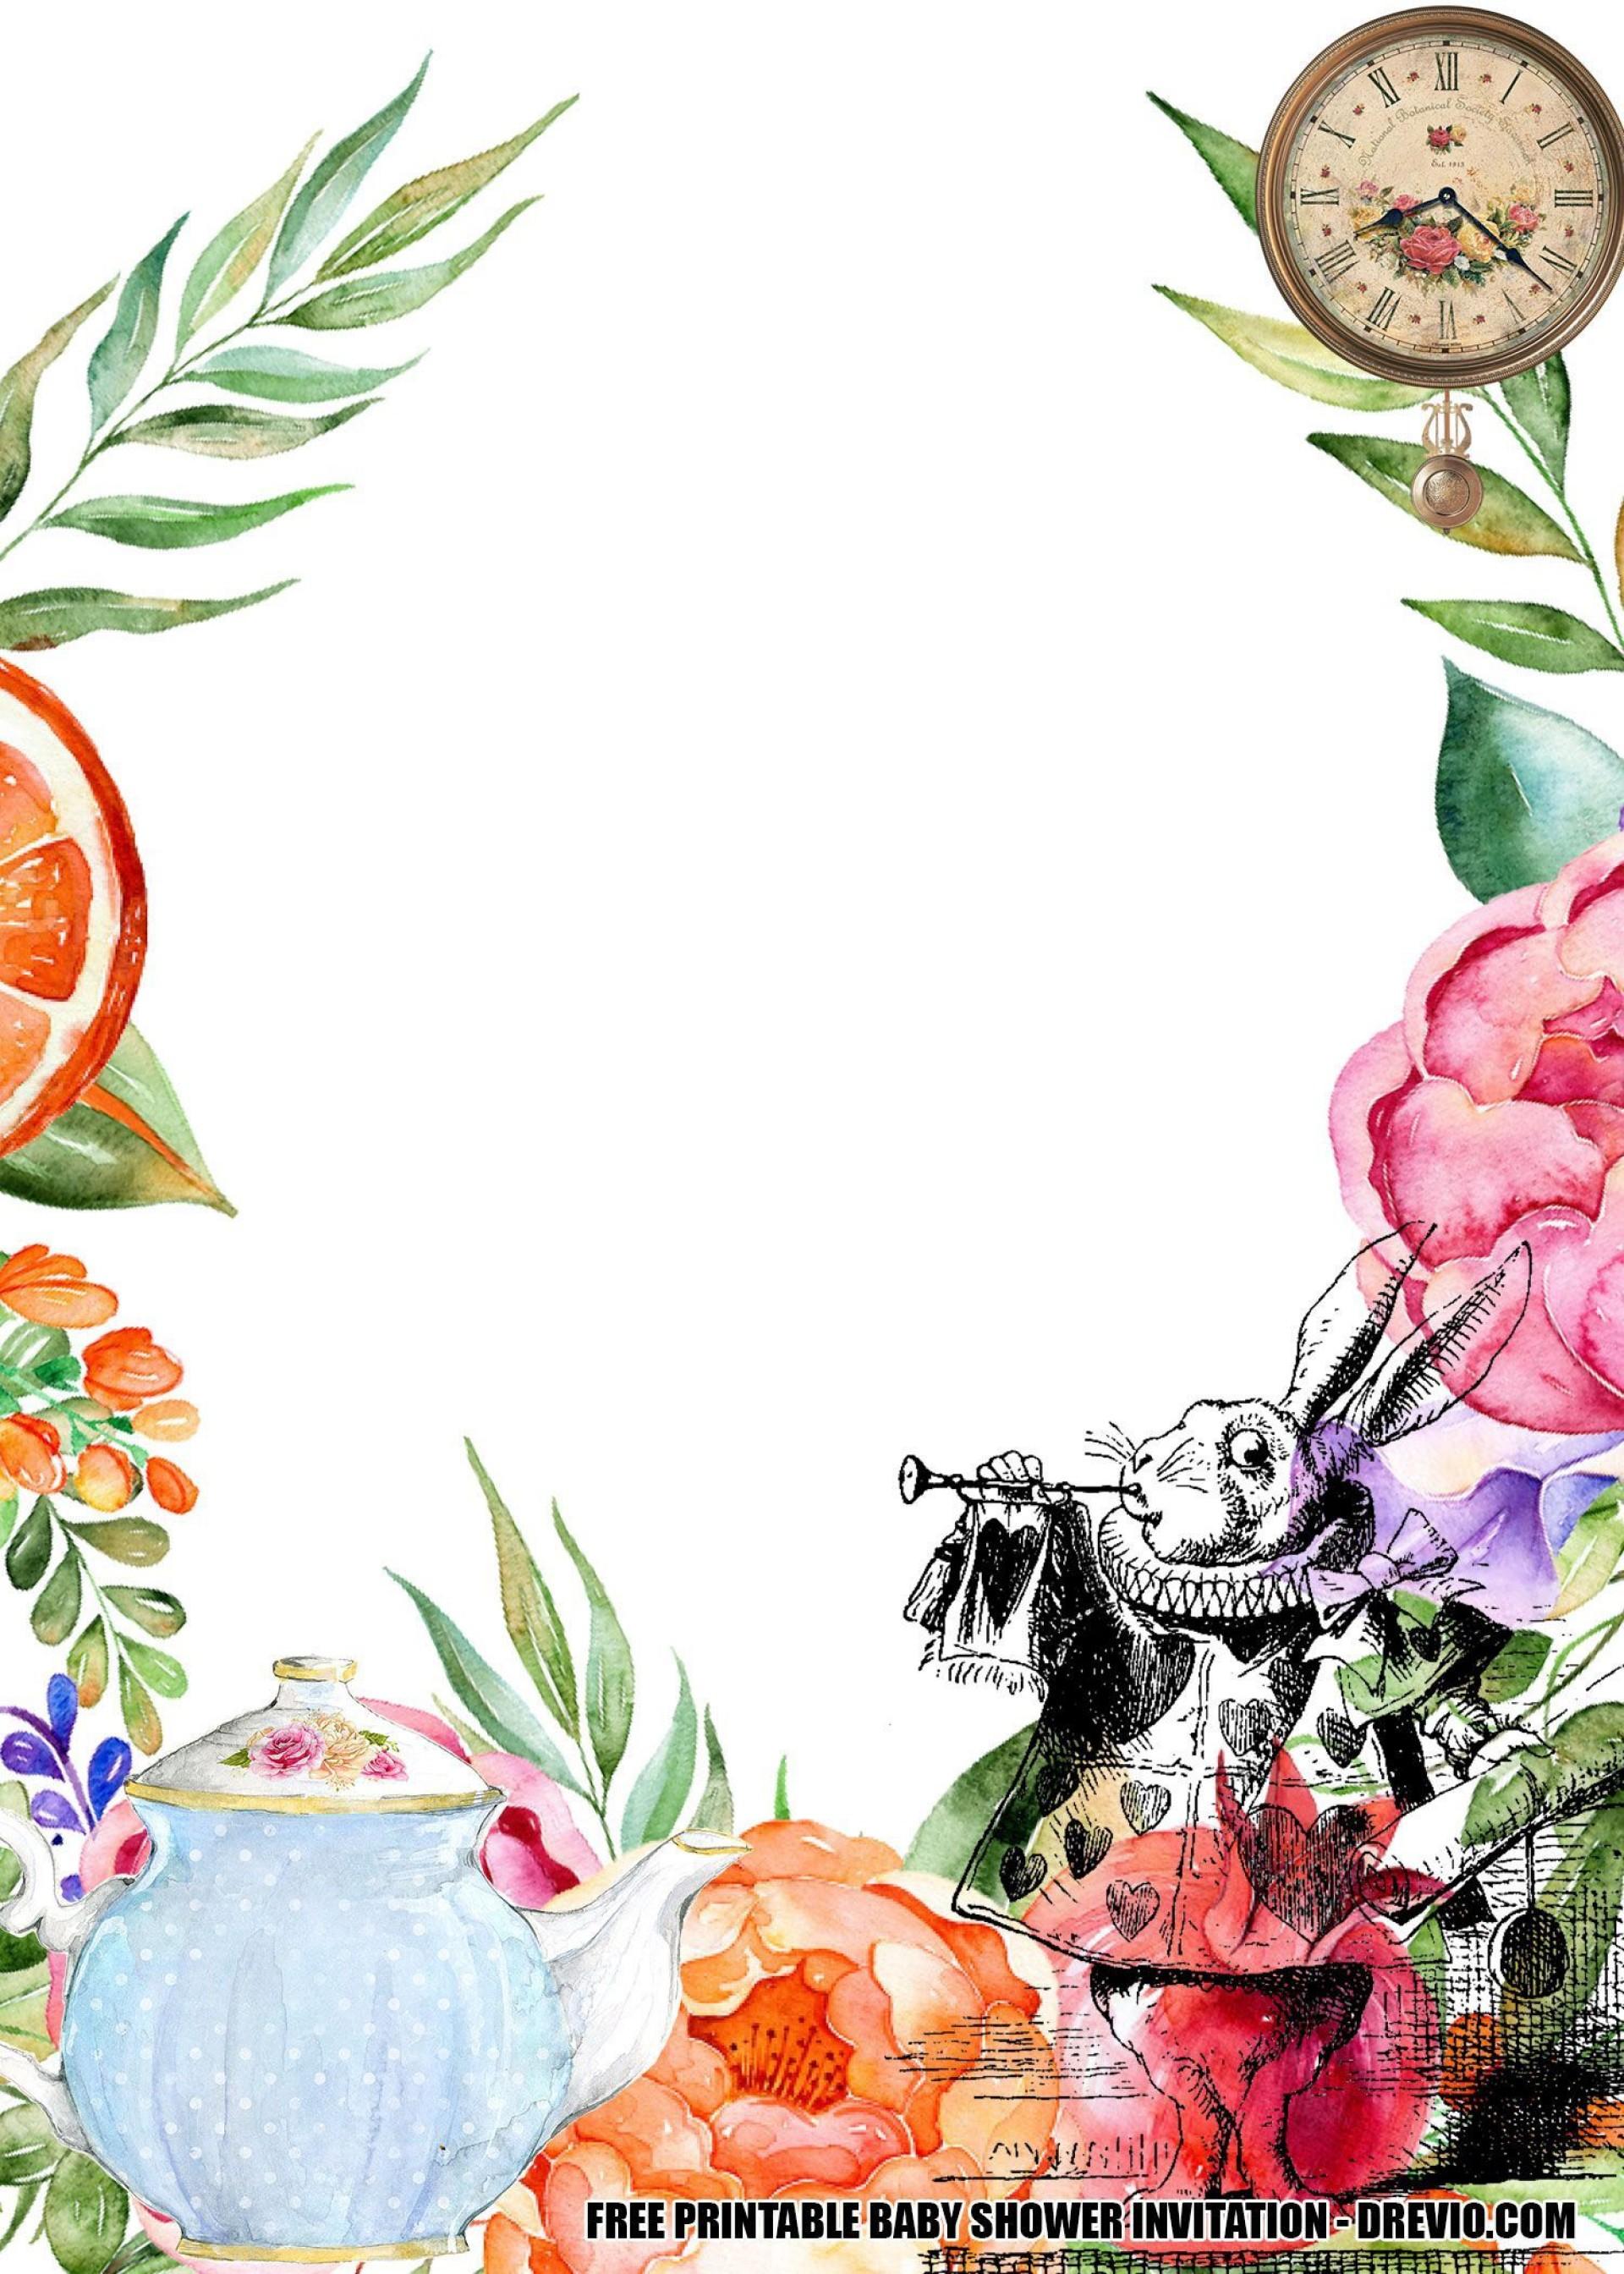 008 Frightening Alice In Wonderland Tea Party Template High Resolution  Templates Invitation Free1920